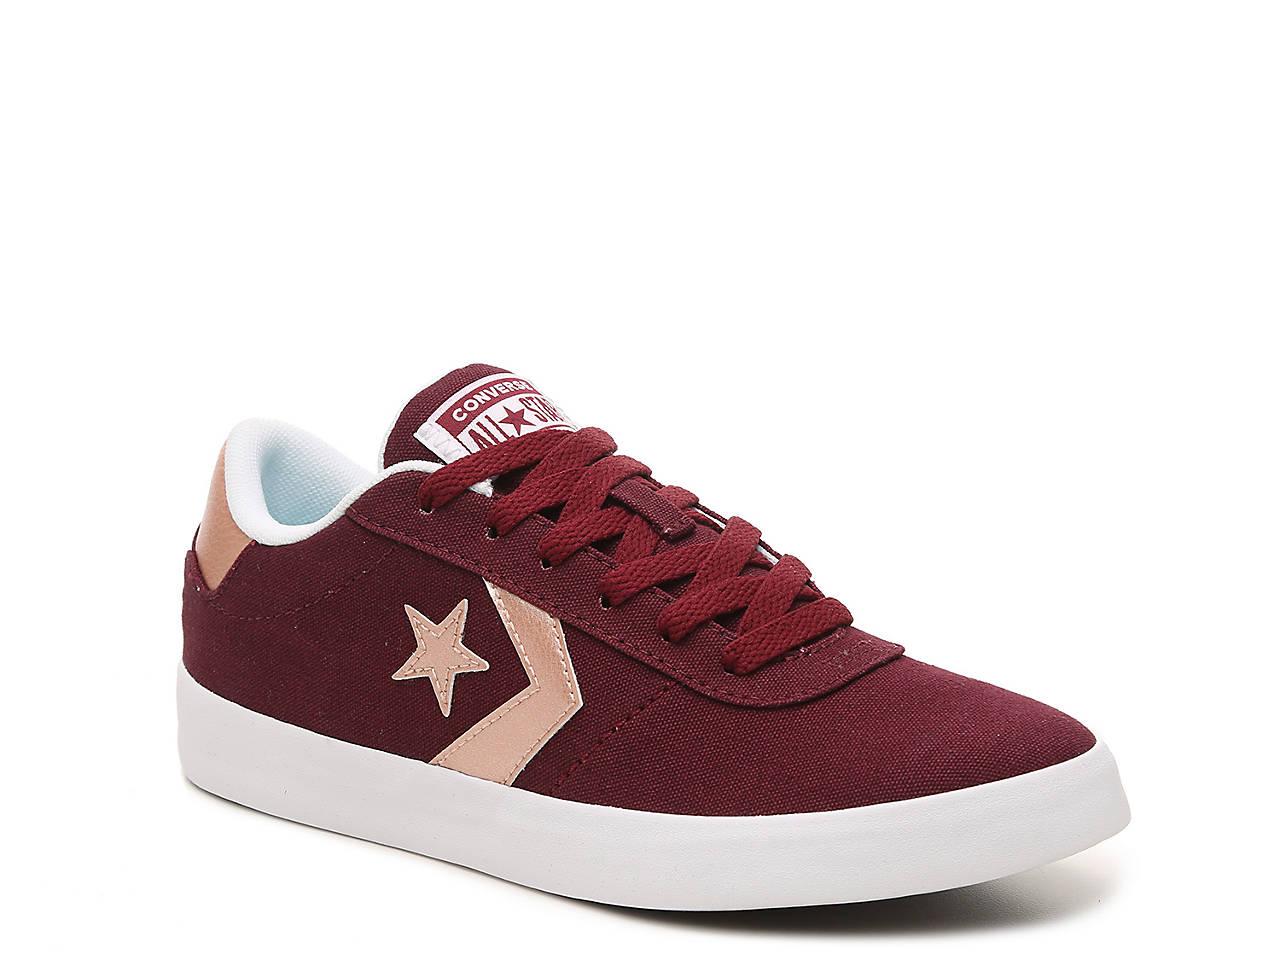 e8636a94edd9 Converse Point Star Sneaker - Women s Women s Shoes